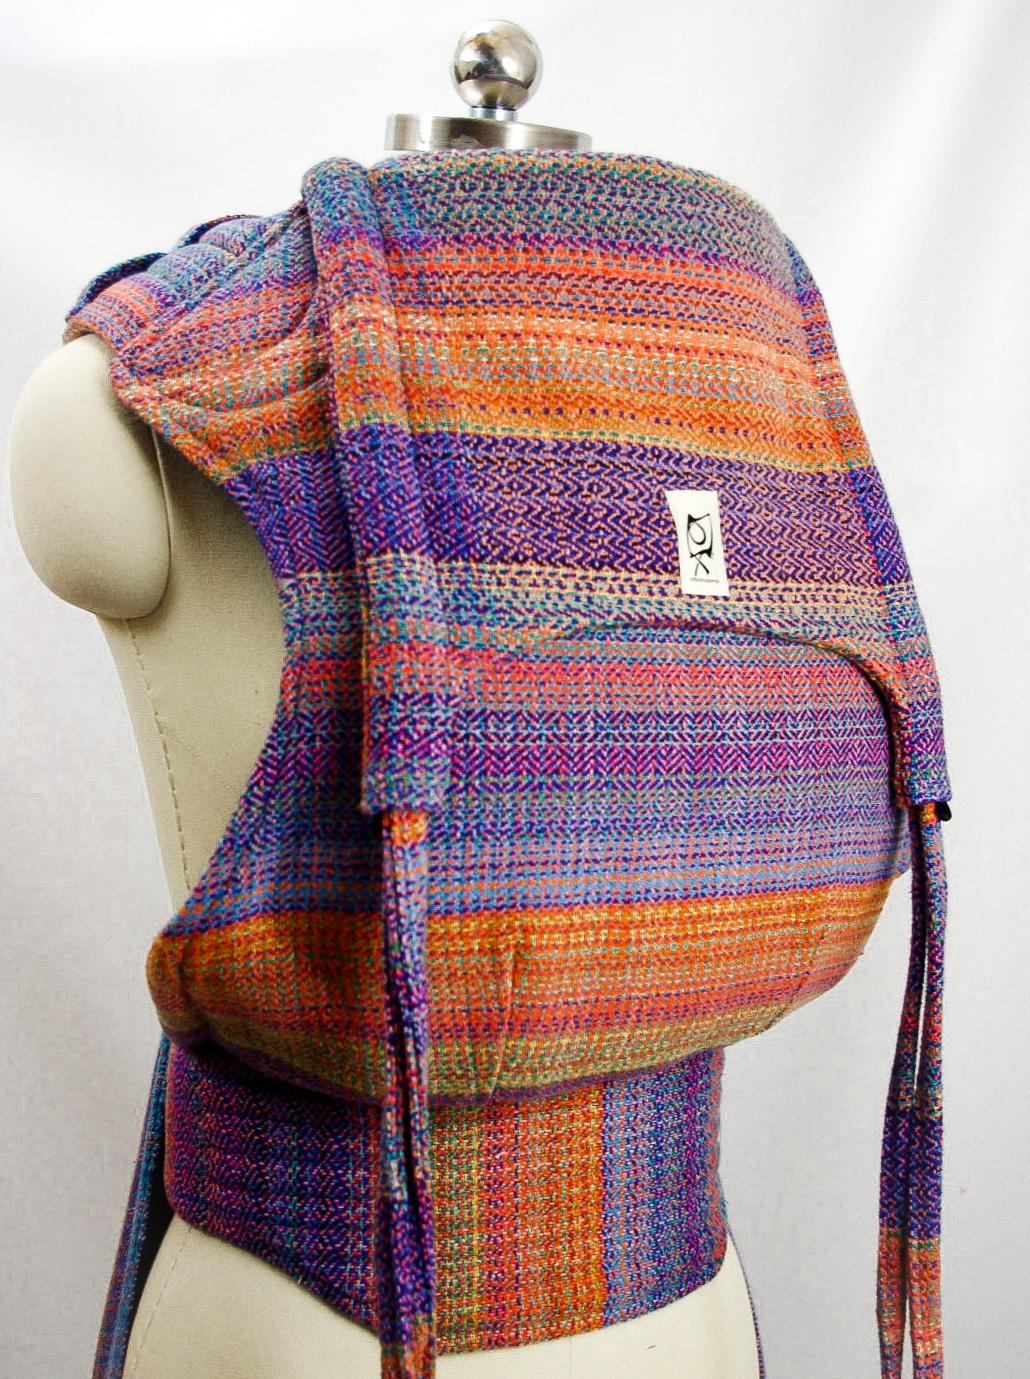 ObiMama Wrap Conversion Mei Tai Banu Textiles' Farideh Opalicious